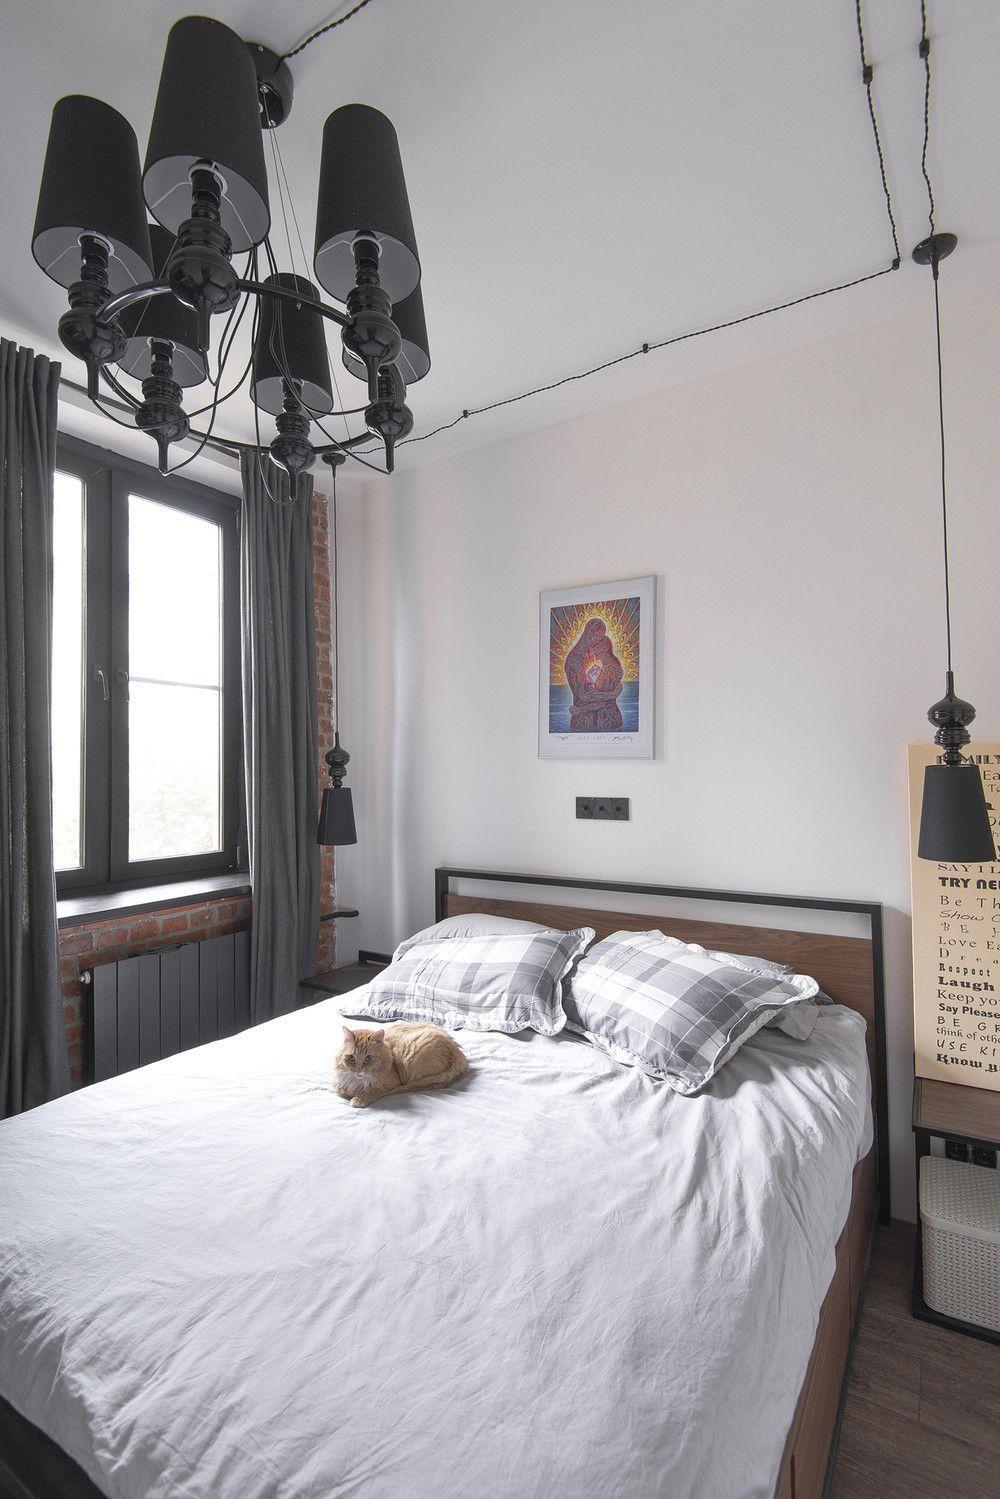 adelaparvu.com despre apartament in stil industrial, Moscova, designer Yevgeniya Razuvayeva, 9design, Foto Dean Alexandrov (3)